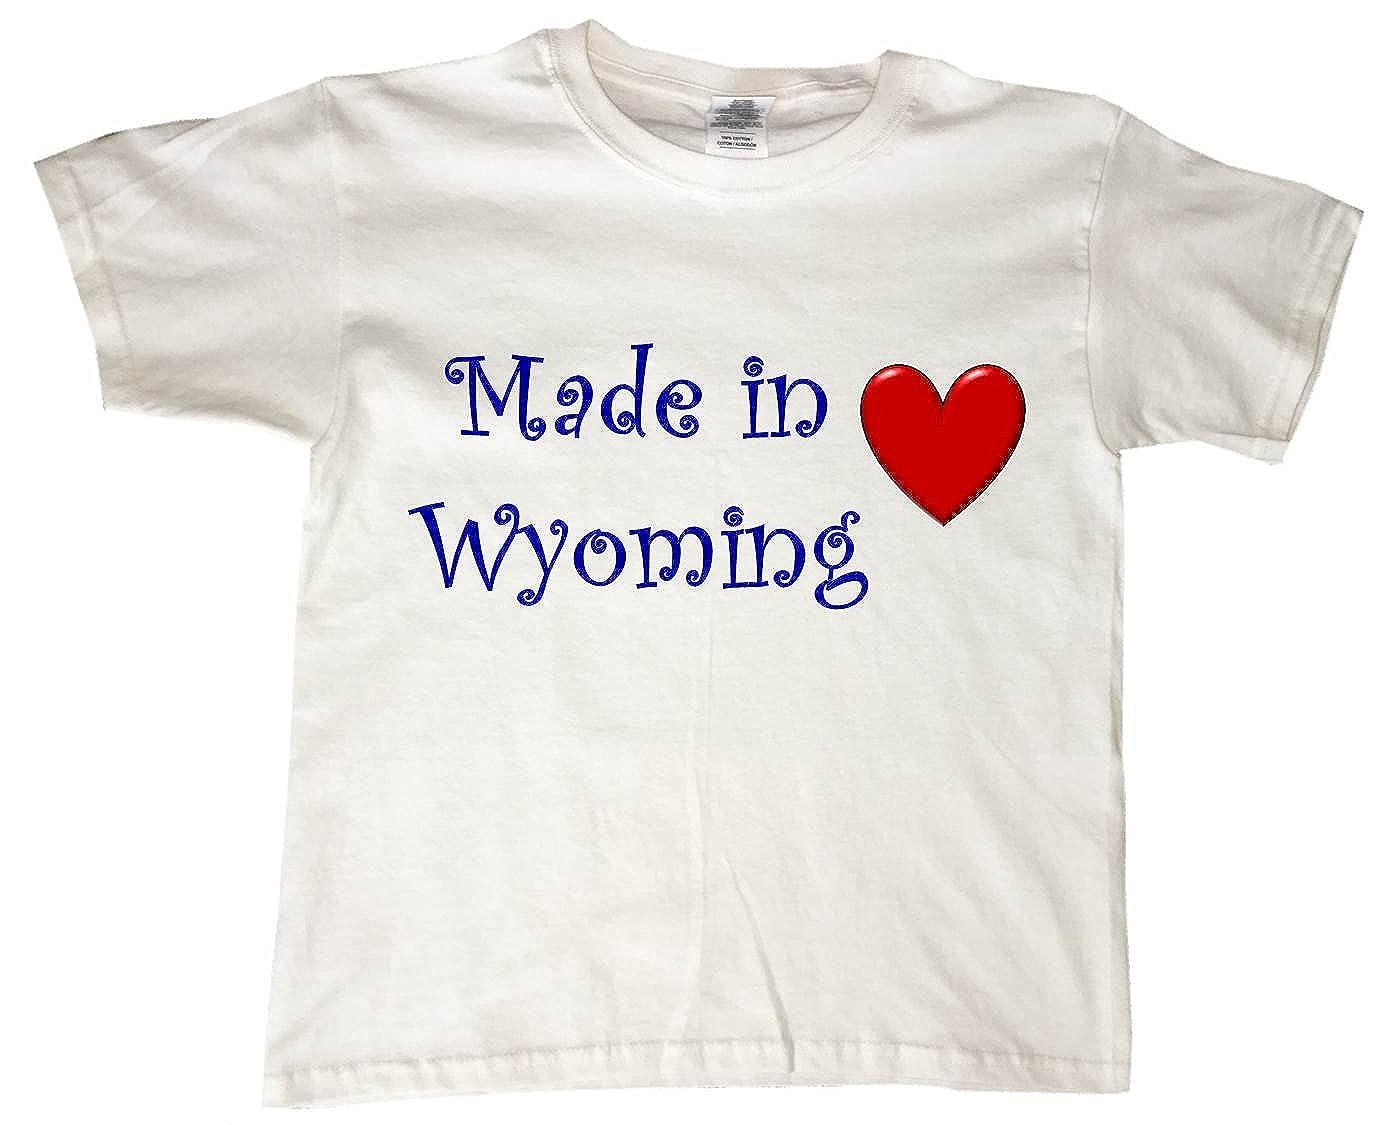 MADE IN WYOMING - BigBoyMusic Youth Designs - White T-shirt